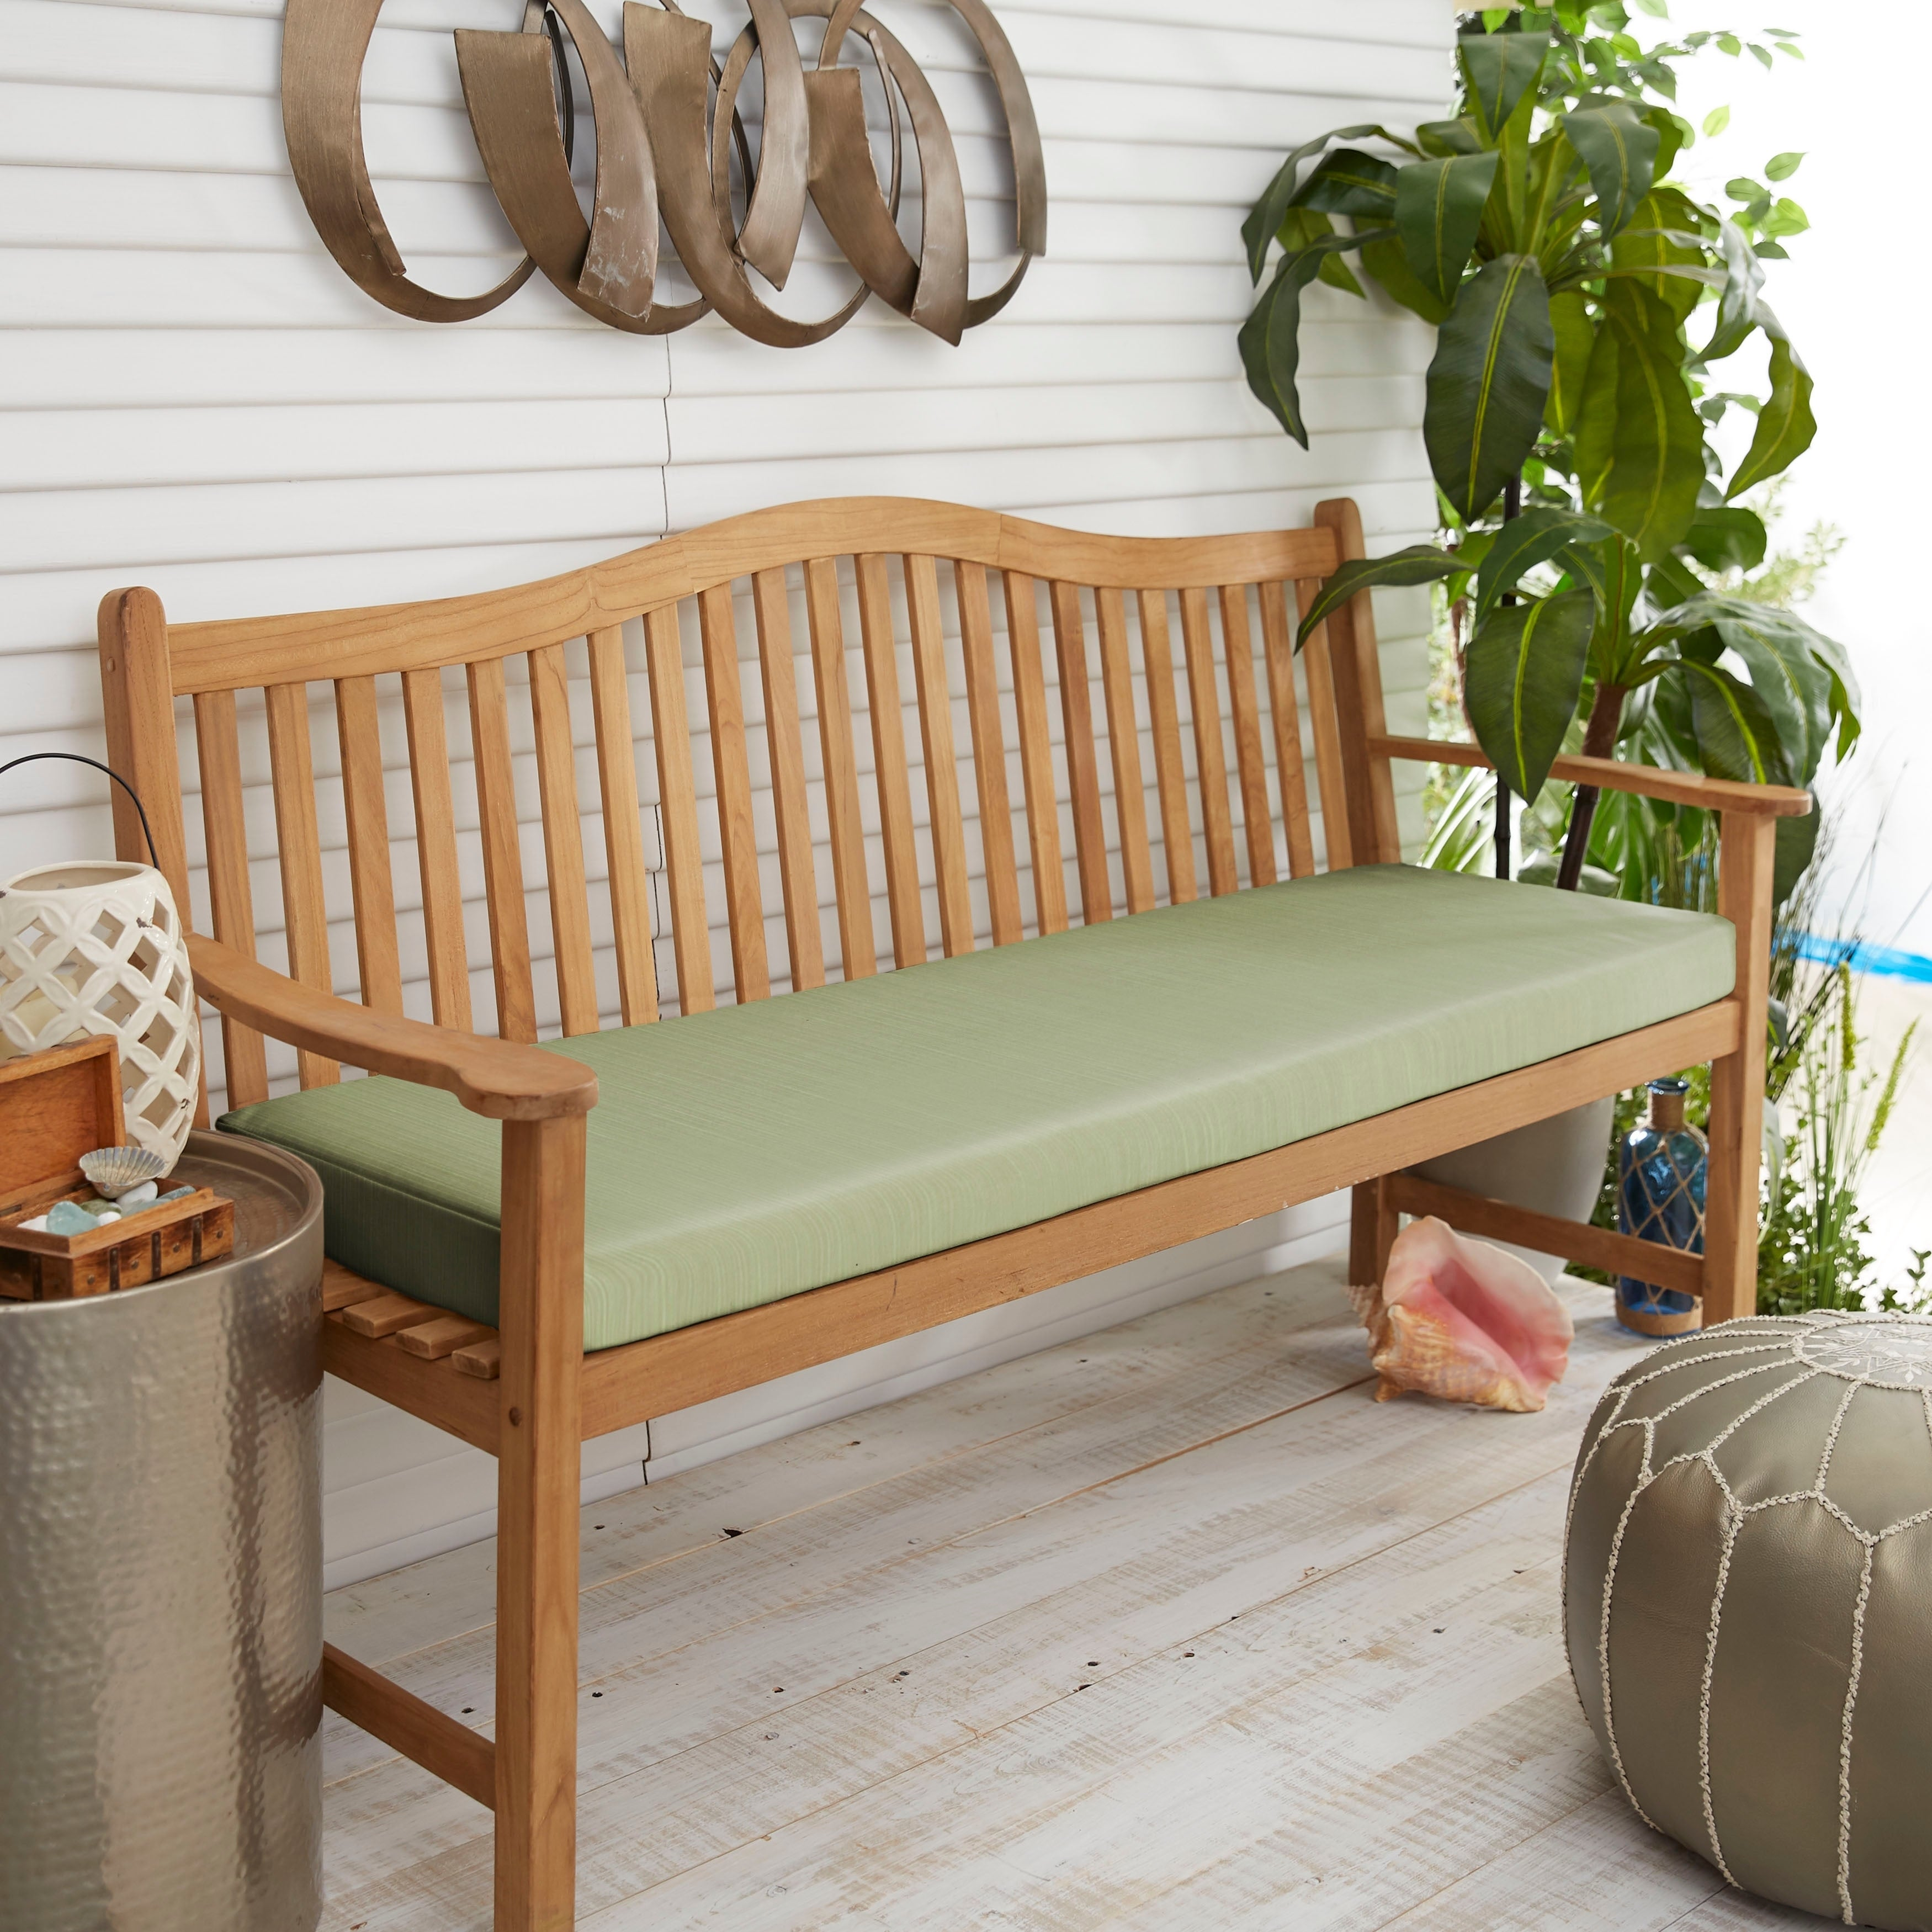 Shop Black Friday Deals On Sunbrella Textured Green Indoor Outdoor Bench Cushion 48 In W X 19 In D Overstock 28889978